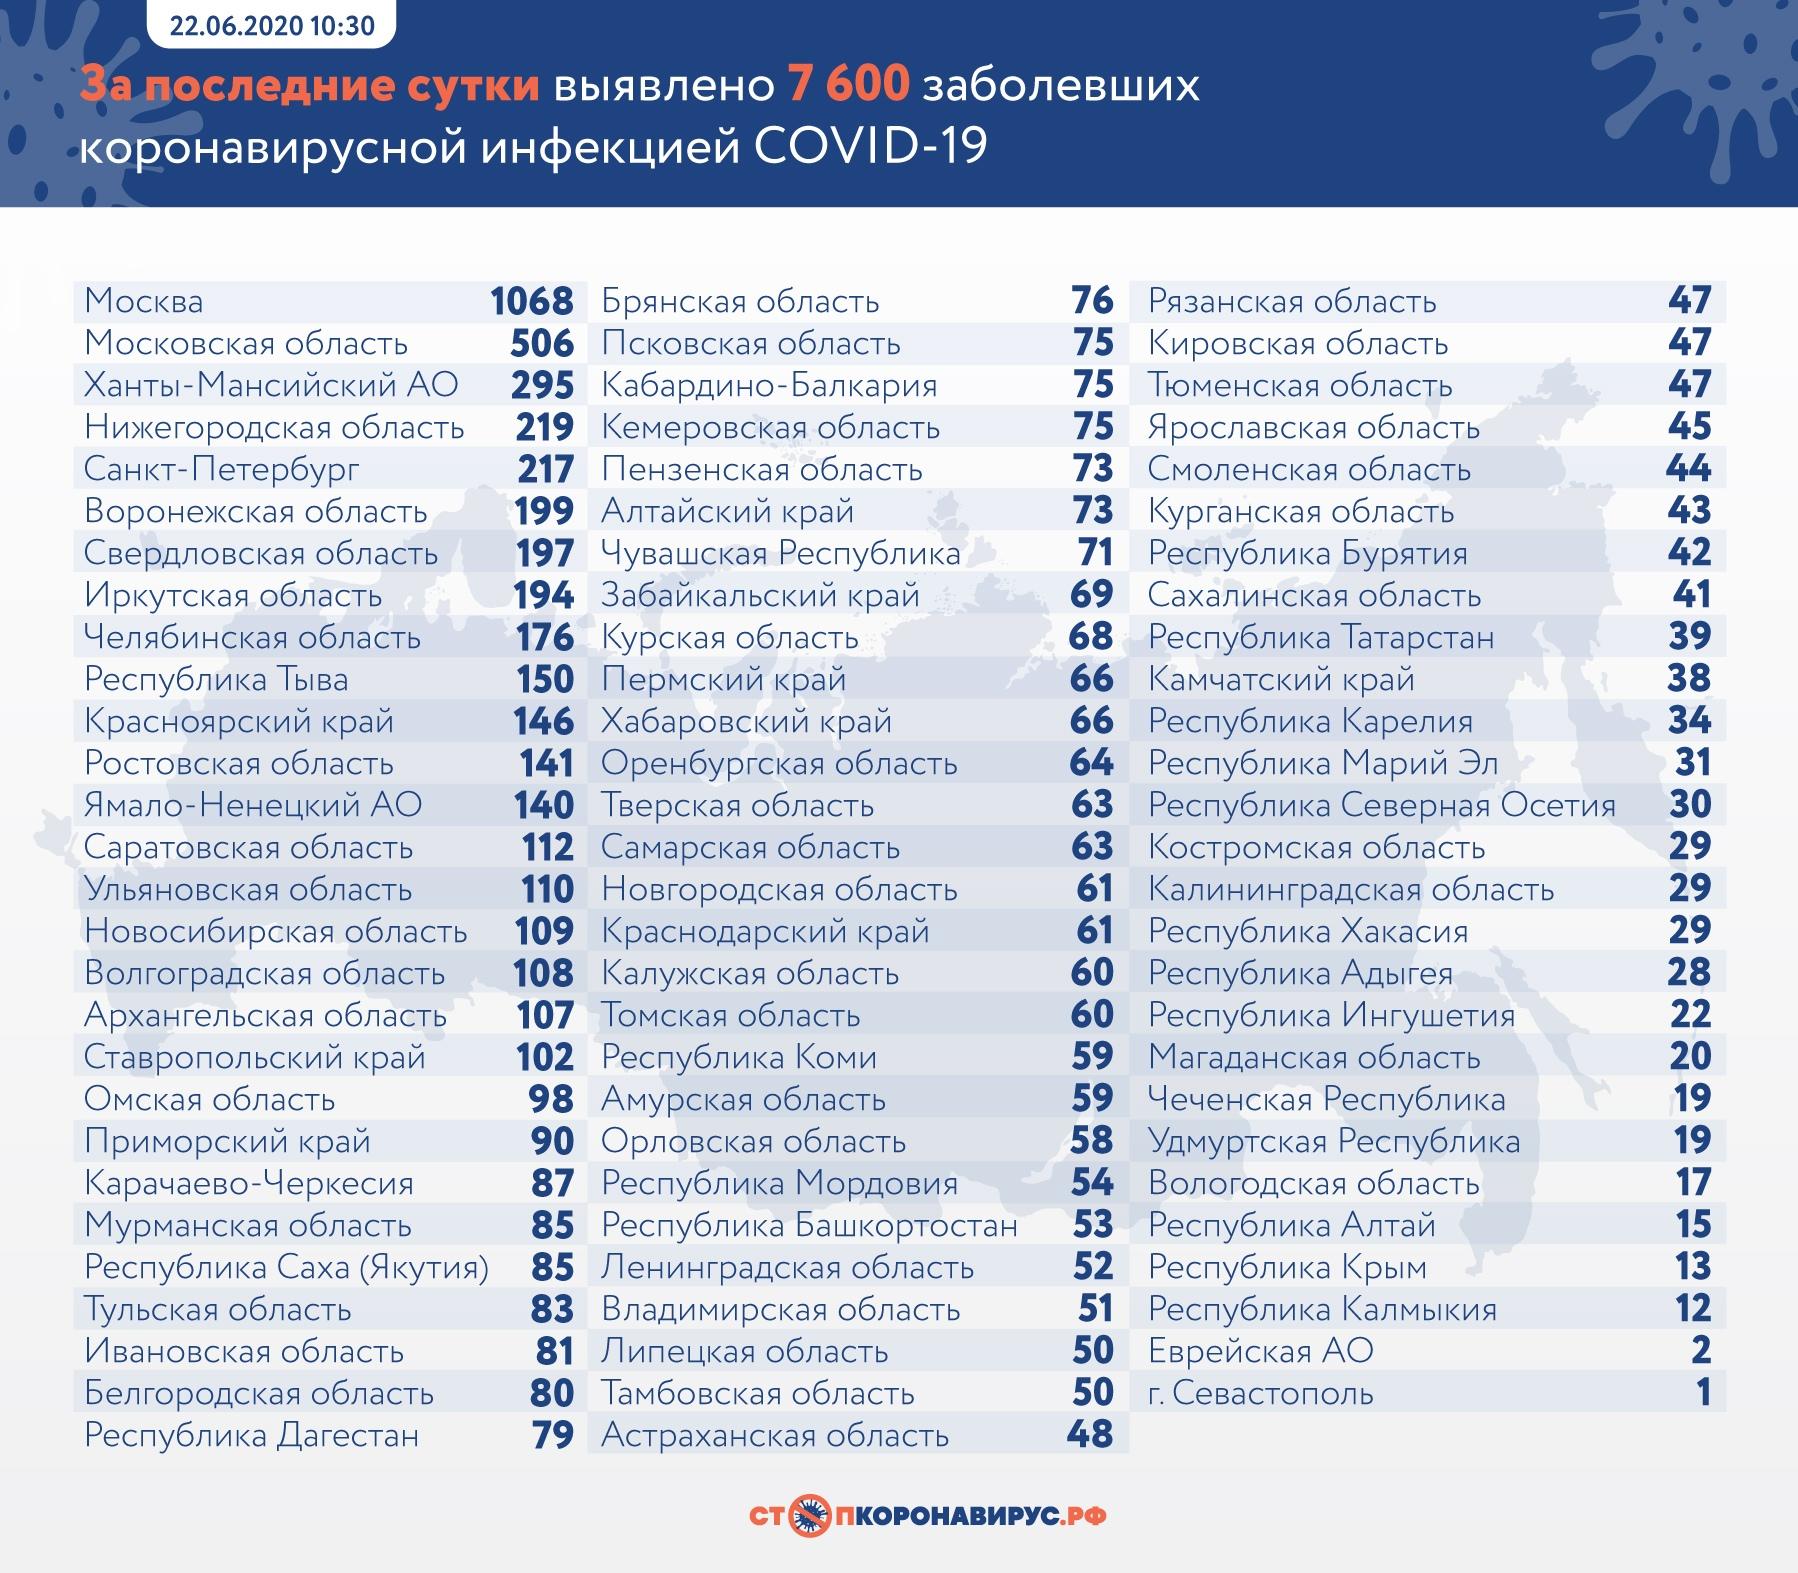 В Самарской области 63 заболевших коронавирусом за сутки